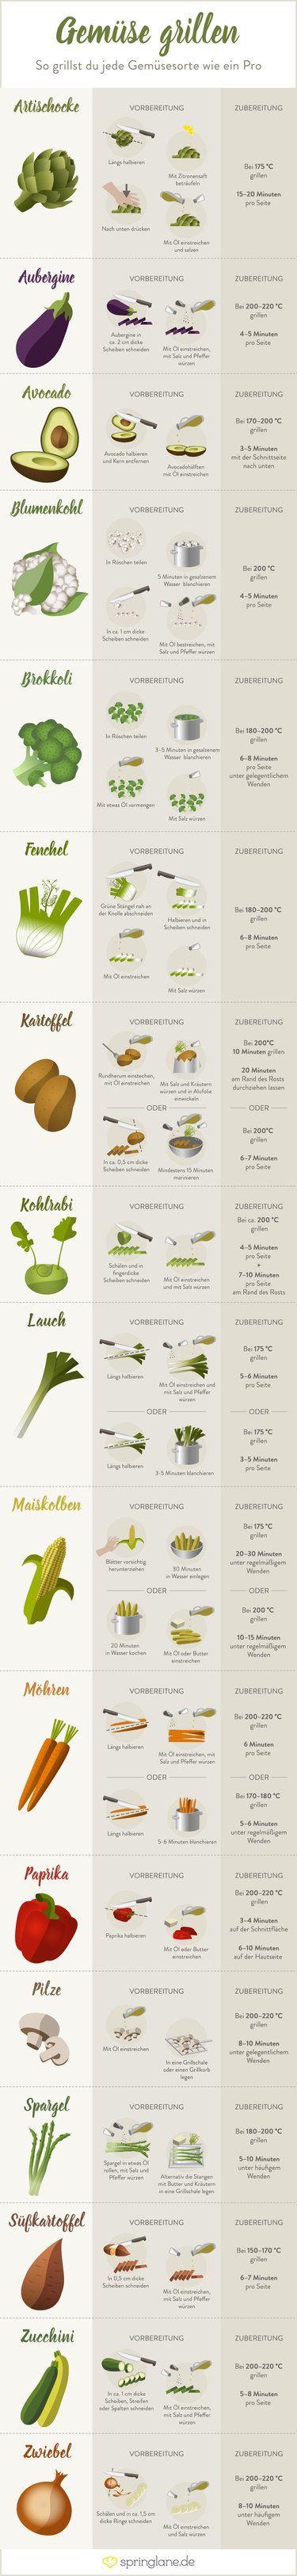 Gemüse grillen - so grillst du jede Gemüsesorte wie ein Pro! #tips